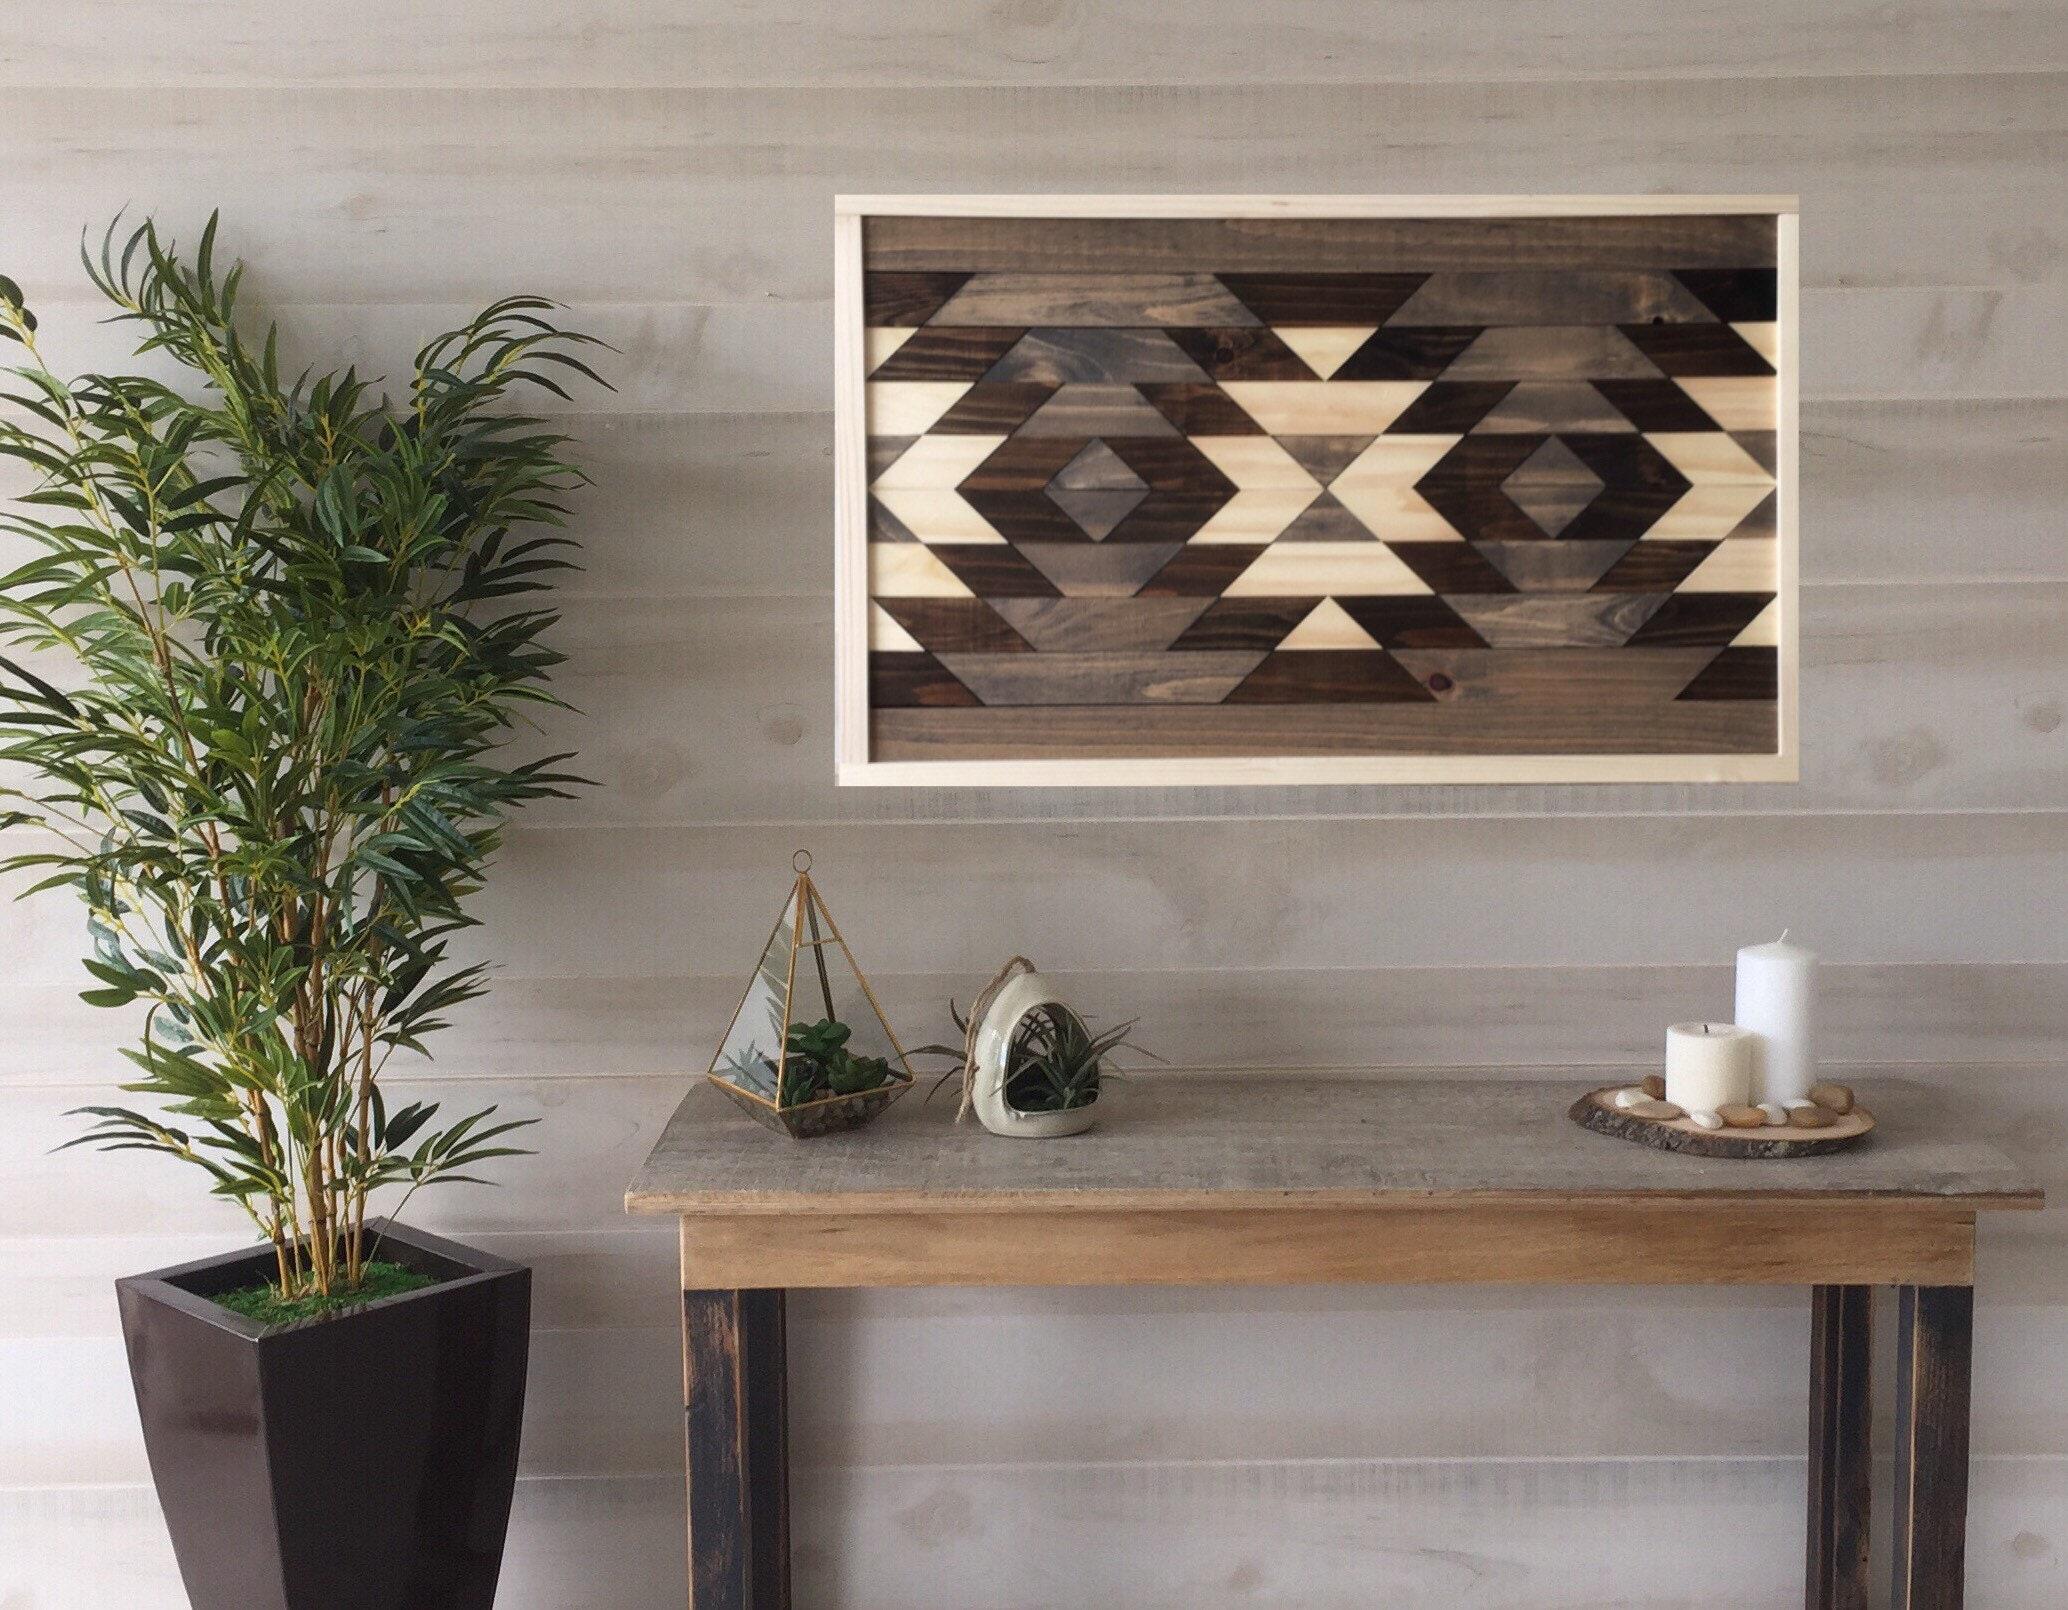 Wood wall art geometric art boho decor aztec decor farmhouse decor modern wall decor wooden decor barn wood decor